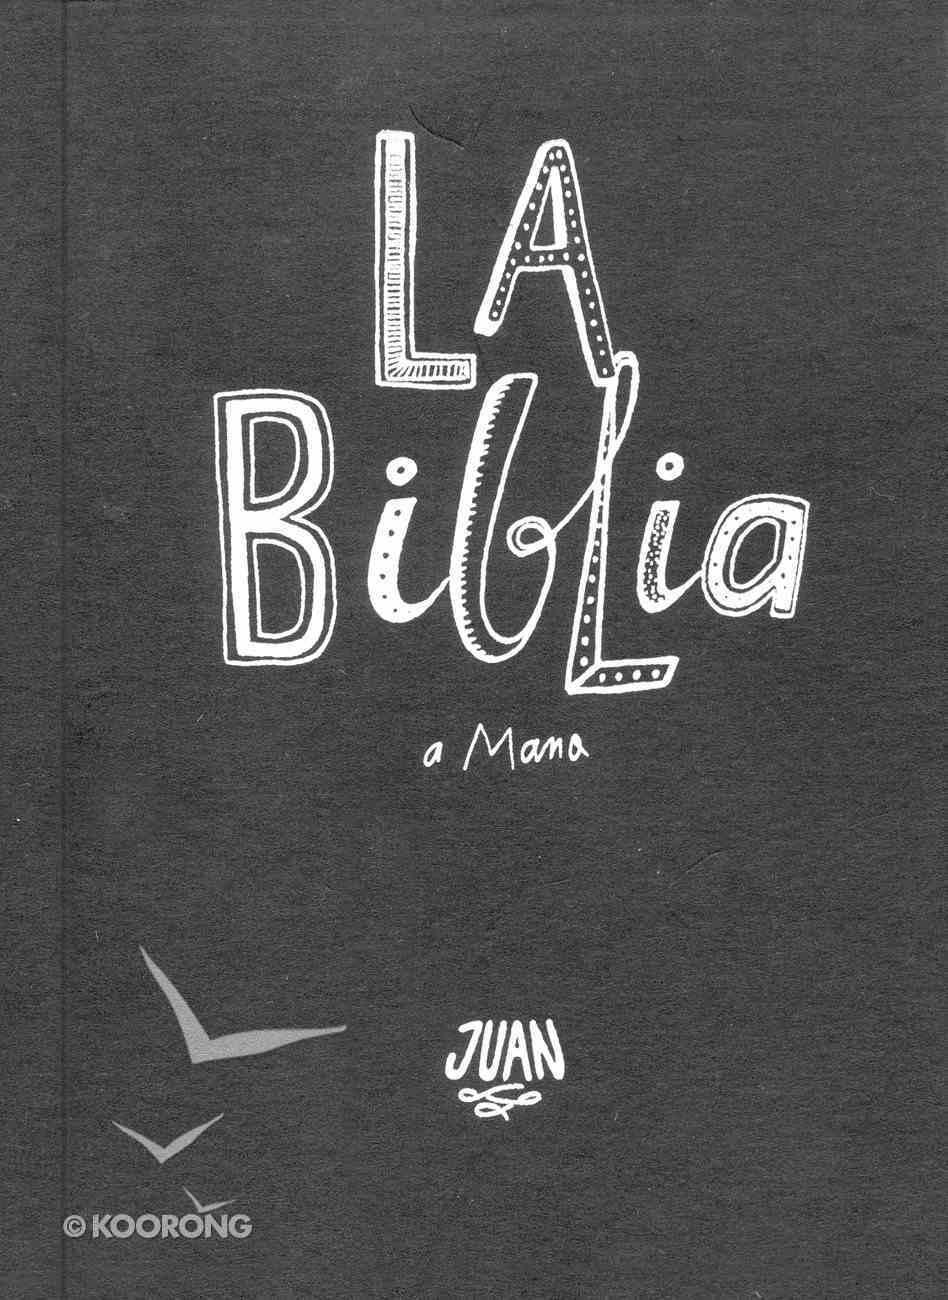 Biblia a Mano, La: Juan (The Bible By Hand, Gospel Of John) Paperback